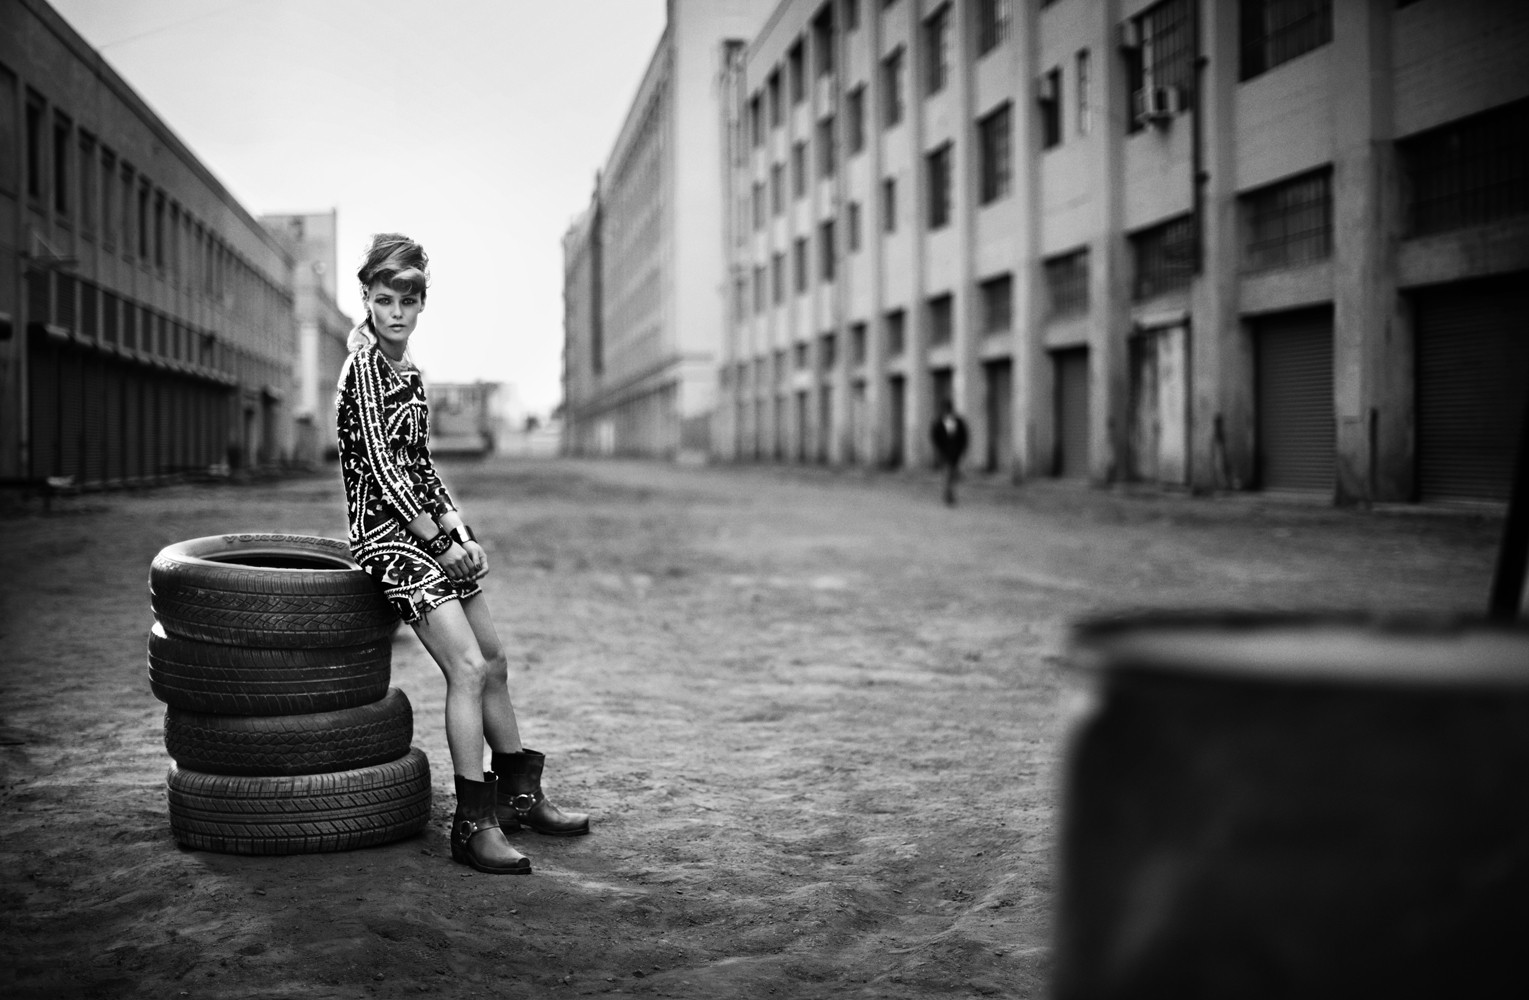 http://3.bp.blogspot.com/-nkoHpwNDd6Q/T6g0KXkIPSI/AAAAAAAAI_8/K4EtrSckXy8/s1600/Interview-Fashiontography-4.jpg